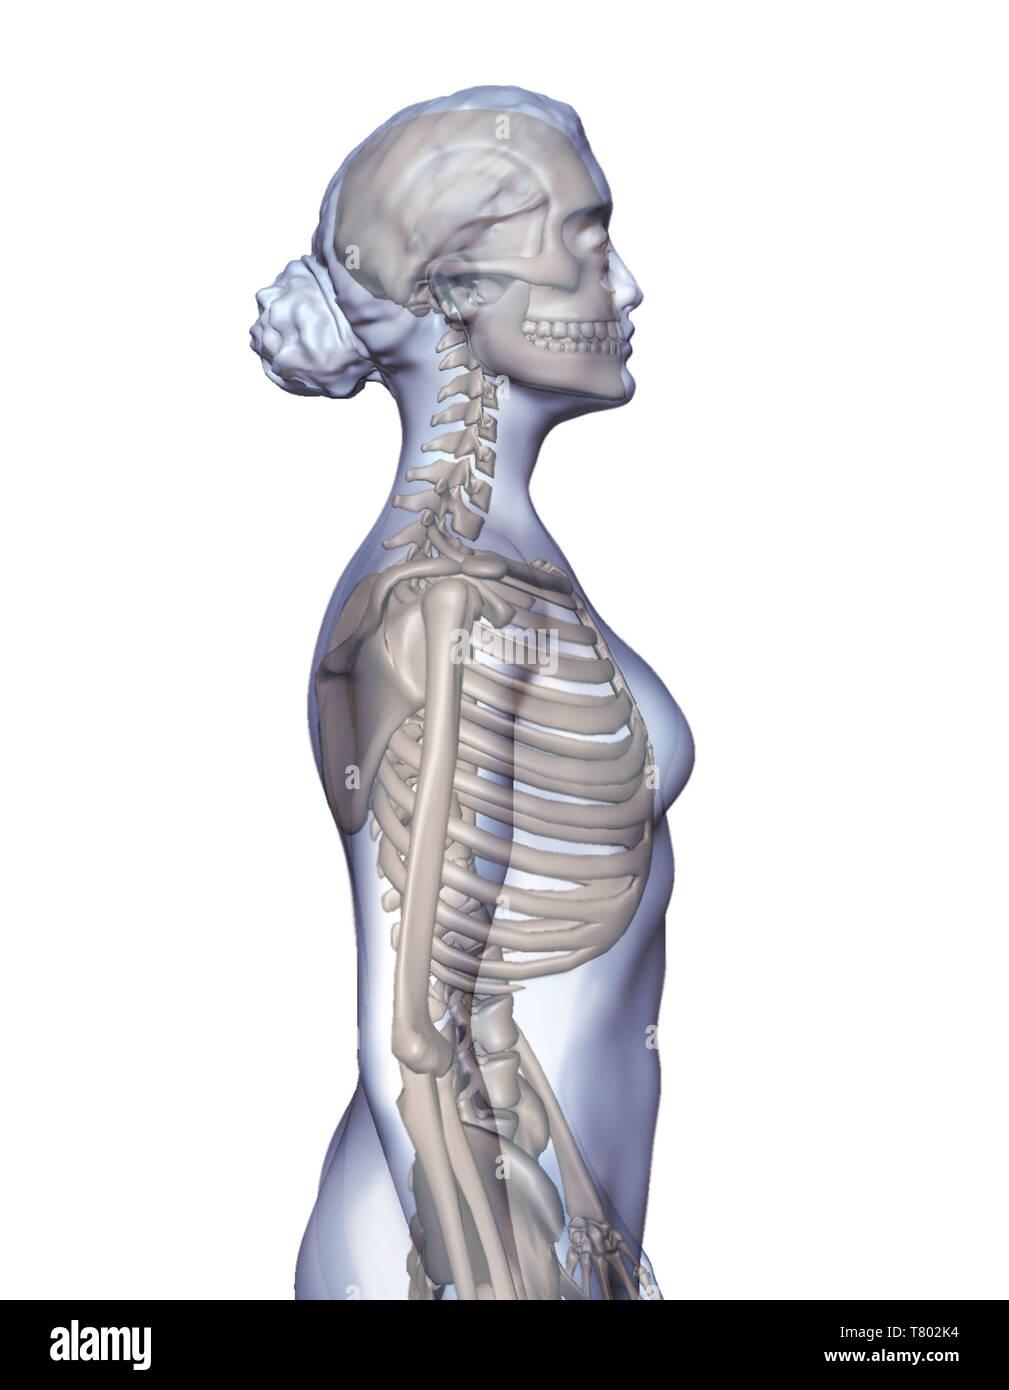 Female Skeletal System, Illustration - Stock Image